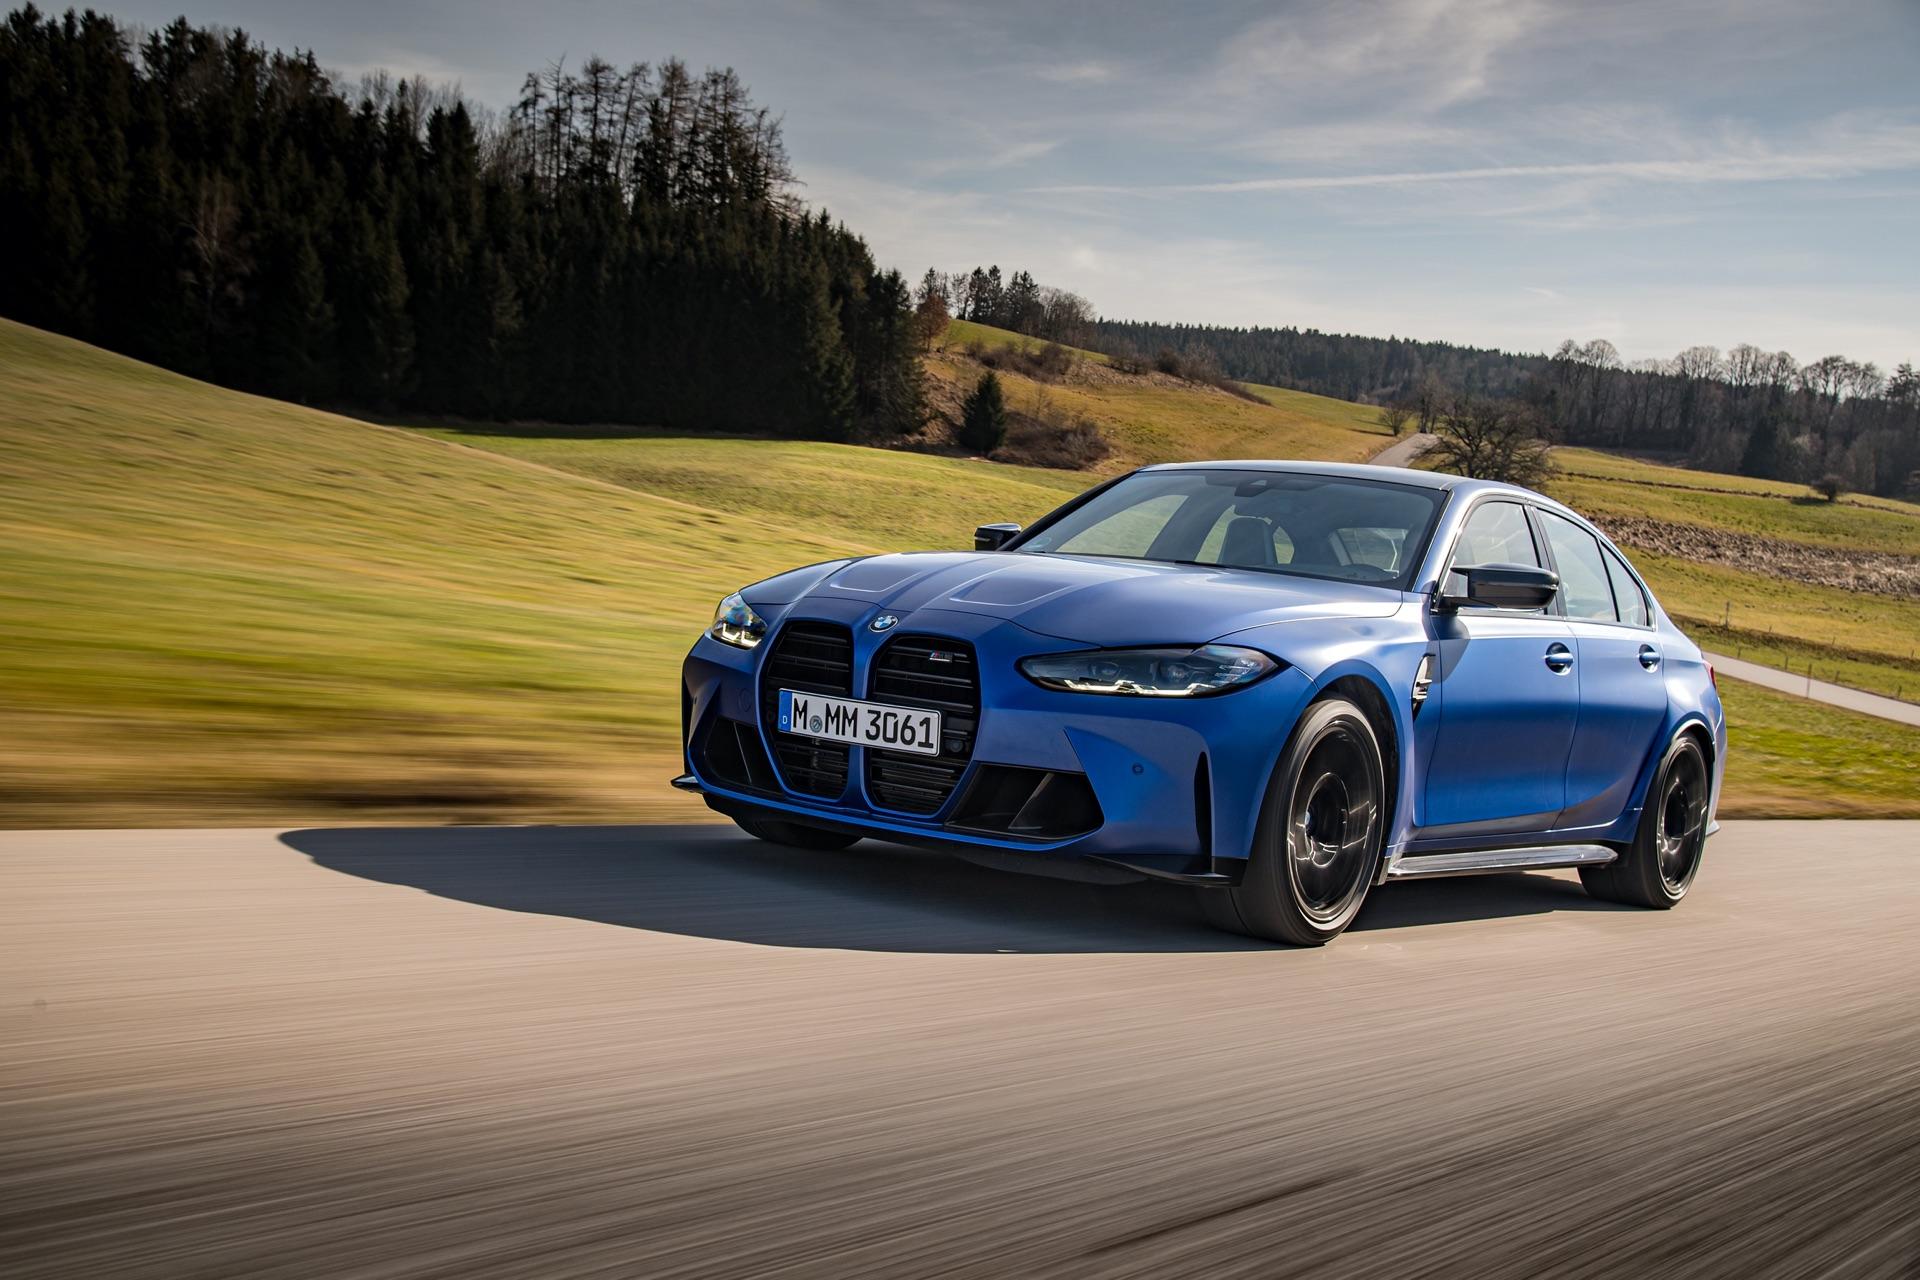 Portimao Blue BMW G80 M3 driving